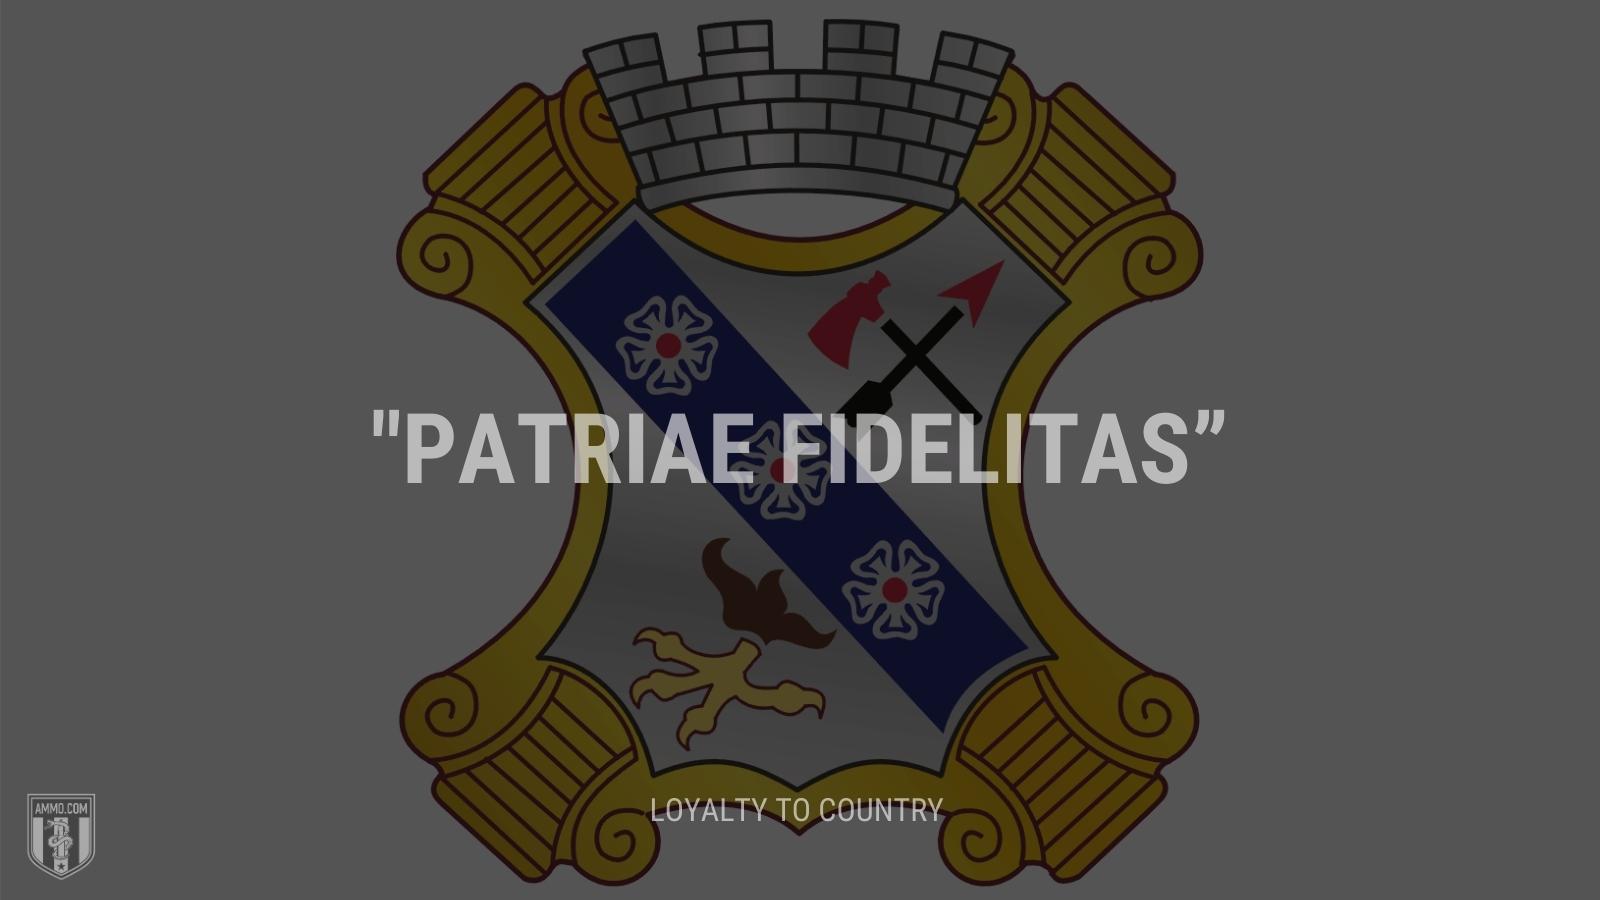 """Patriae fidelitas"" - Loyalty to country"